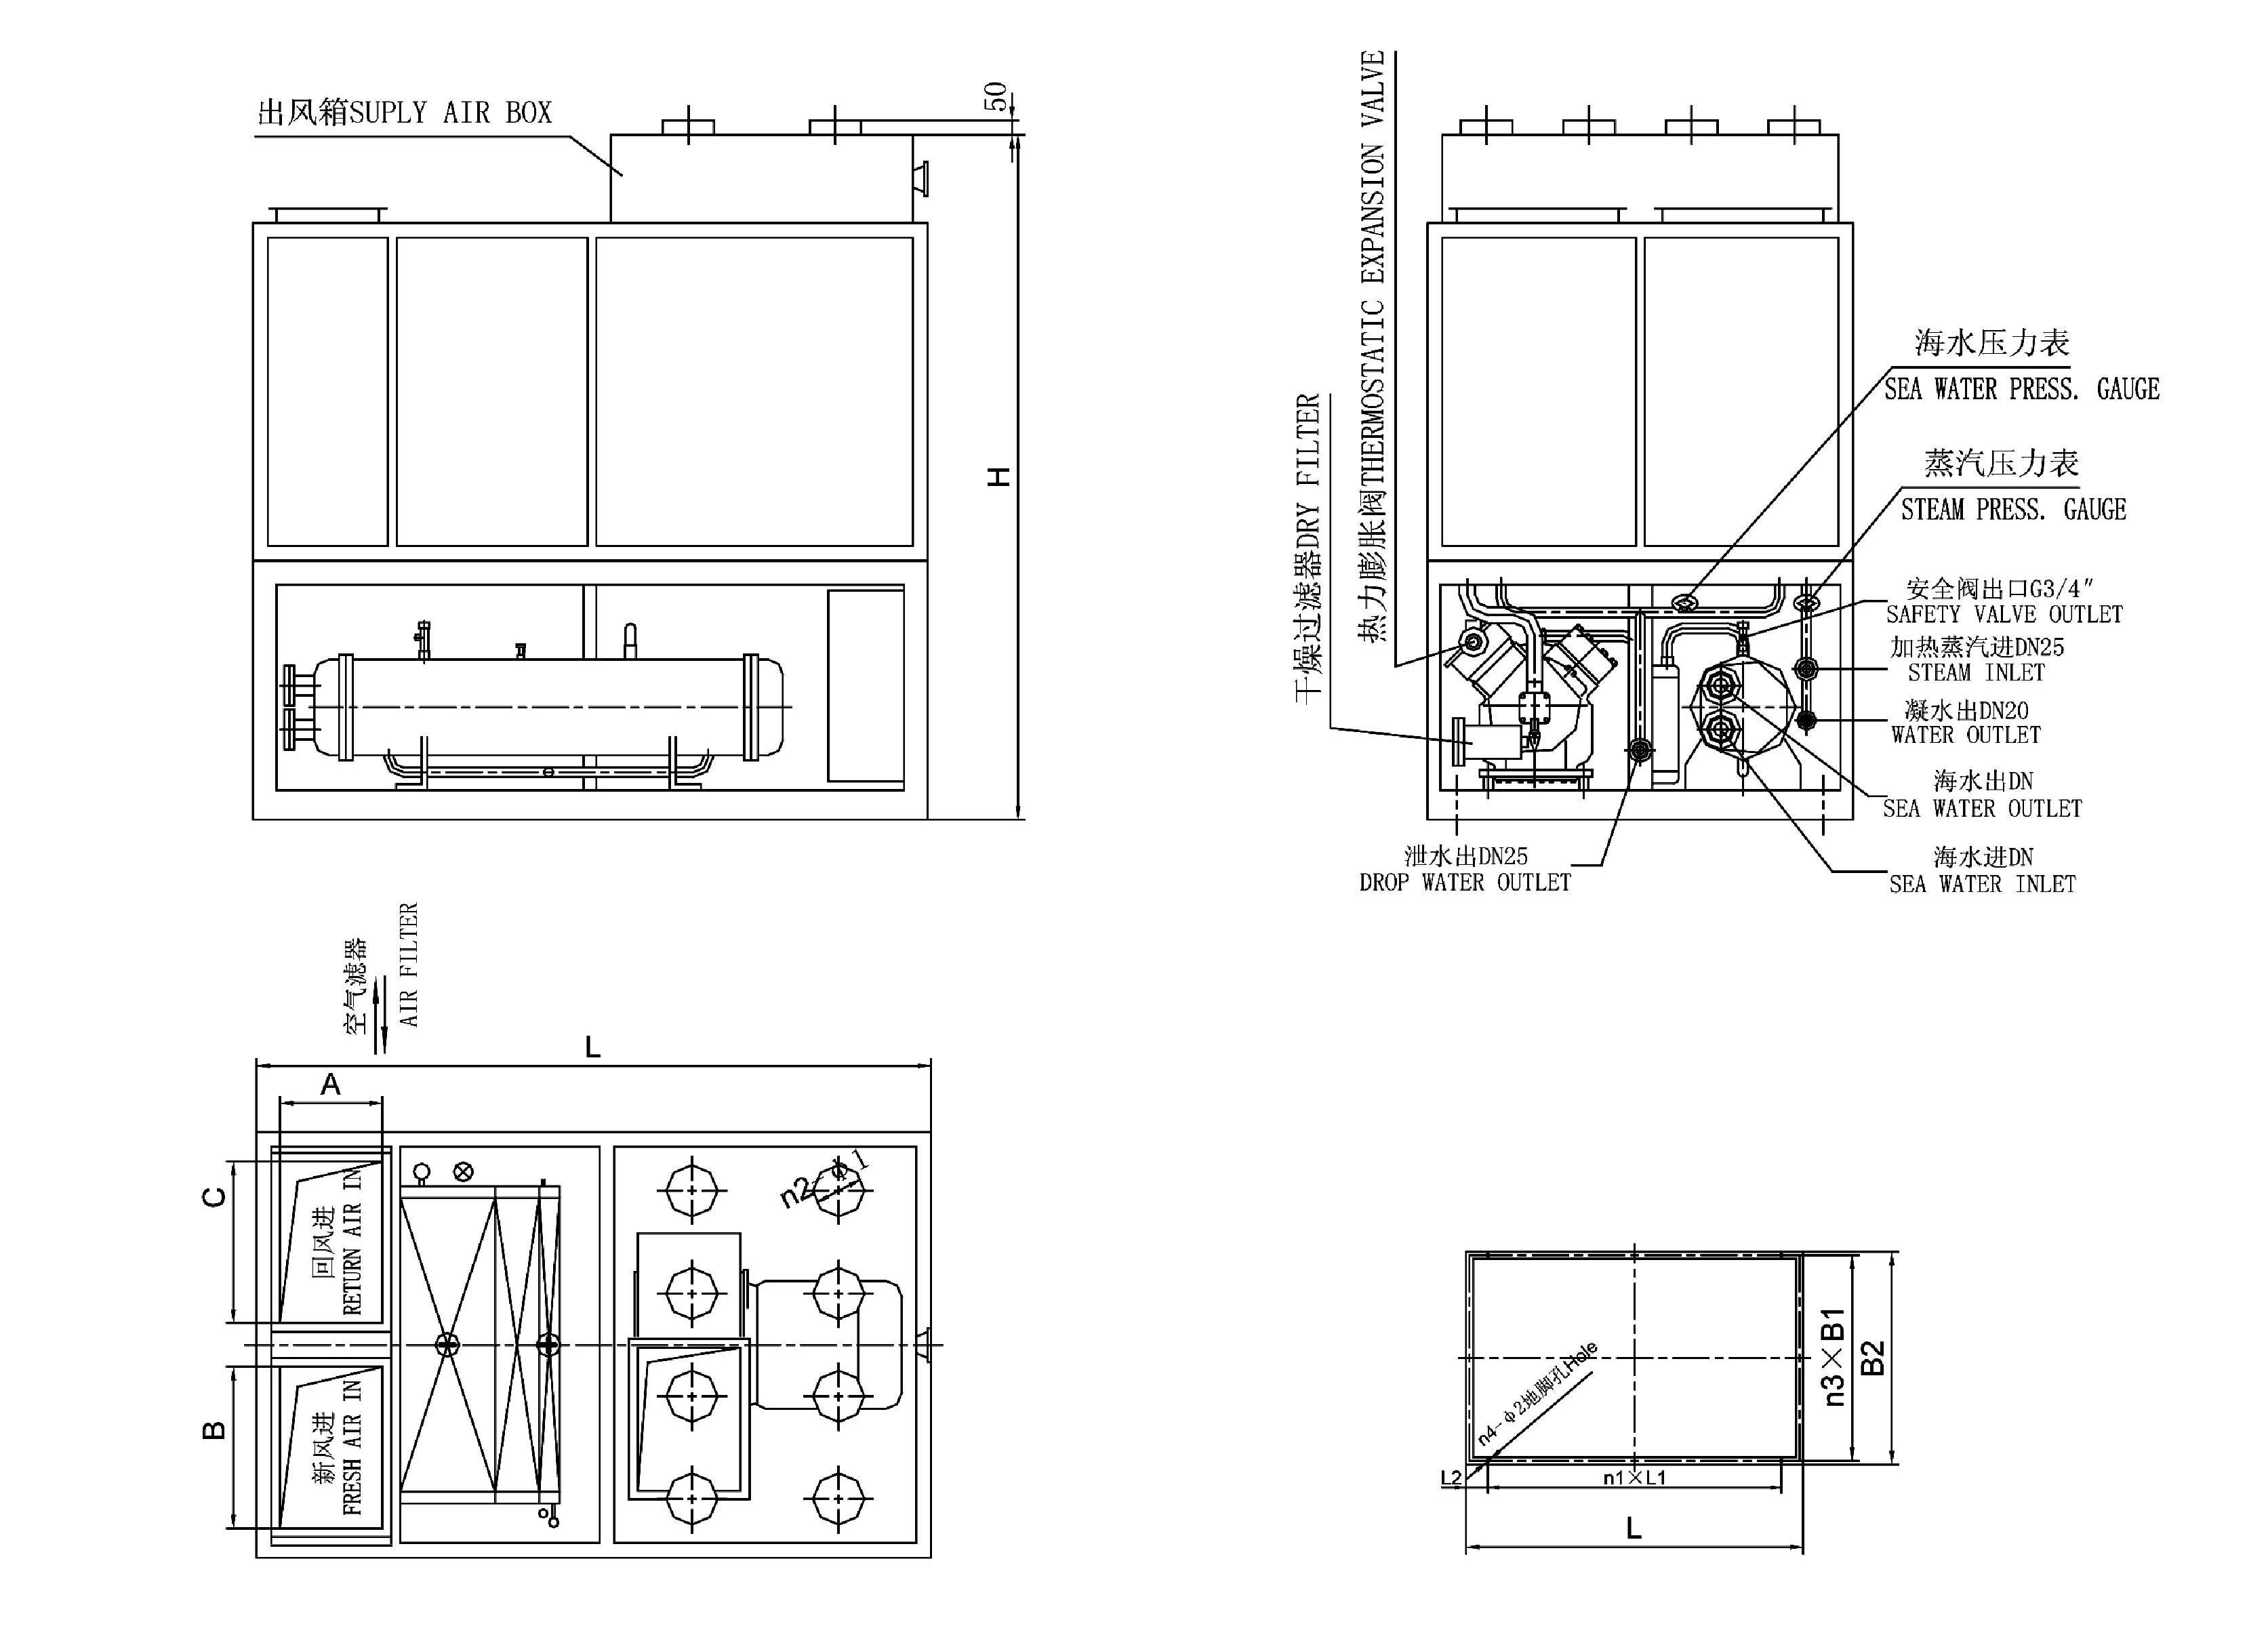 CJKR-50B-Marine-Packaged-Air-Conditioning-Unit-1 York Rtu Wiring Diagram on york heat pump wiring diagram, york ignition diagram, york heat pump parts diagram, york ac schematics, york rtu parts,